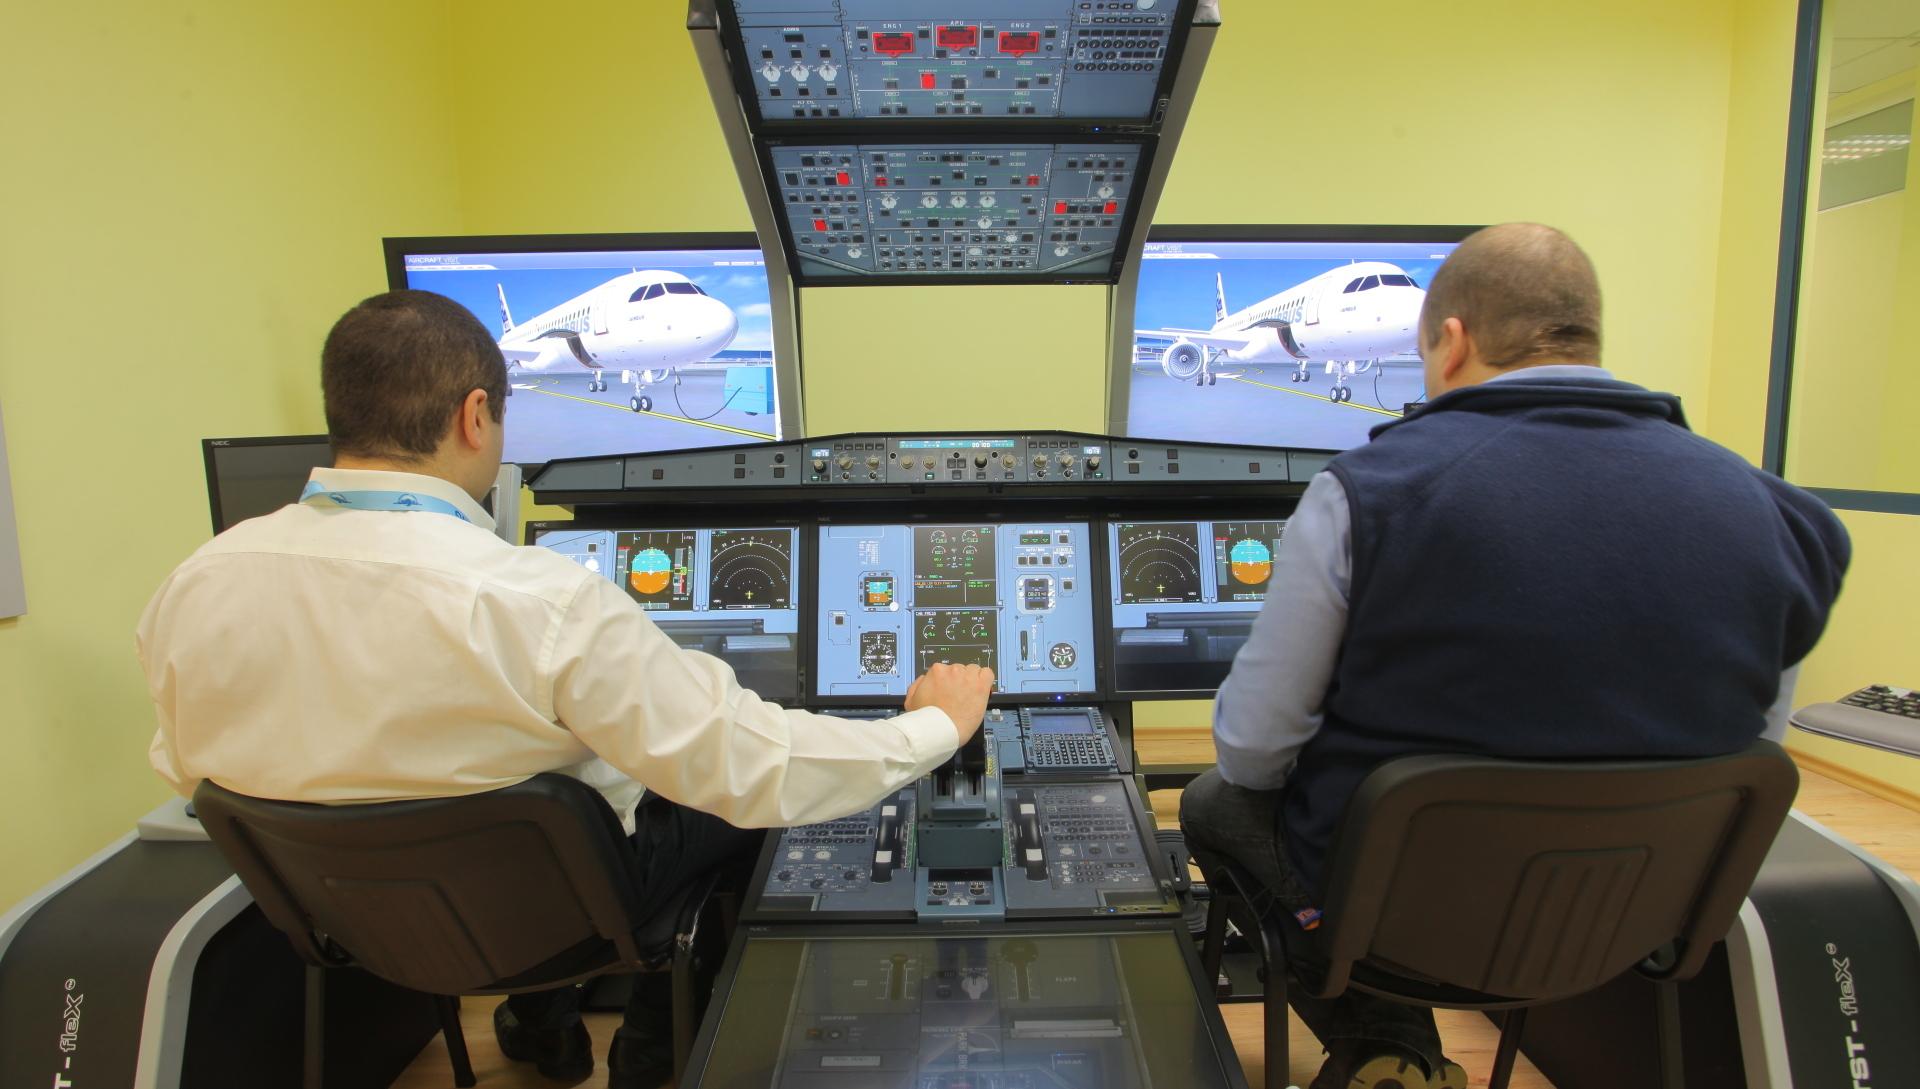 A320 Maintenance and Flight Training Device